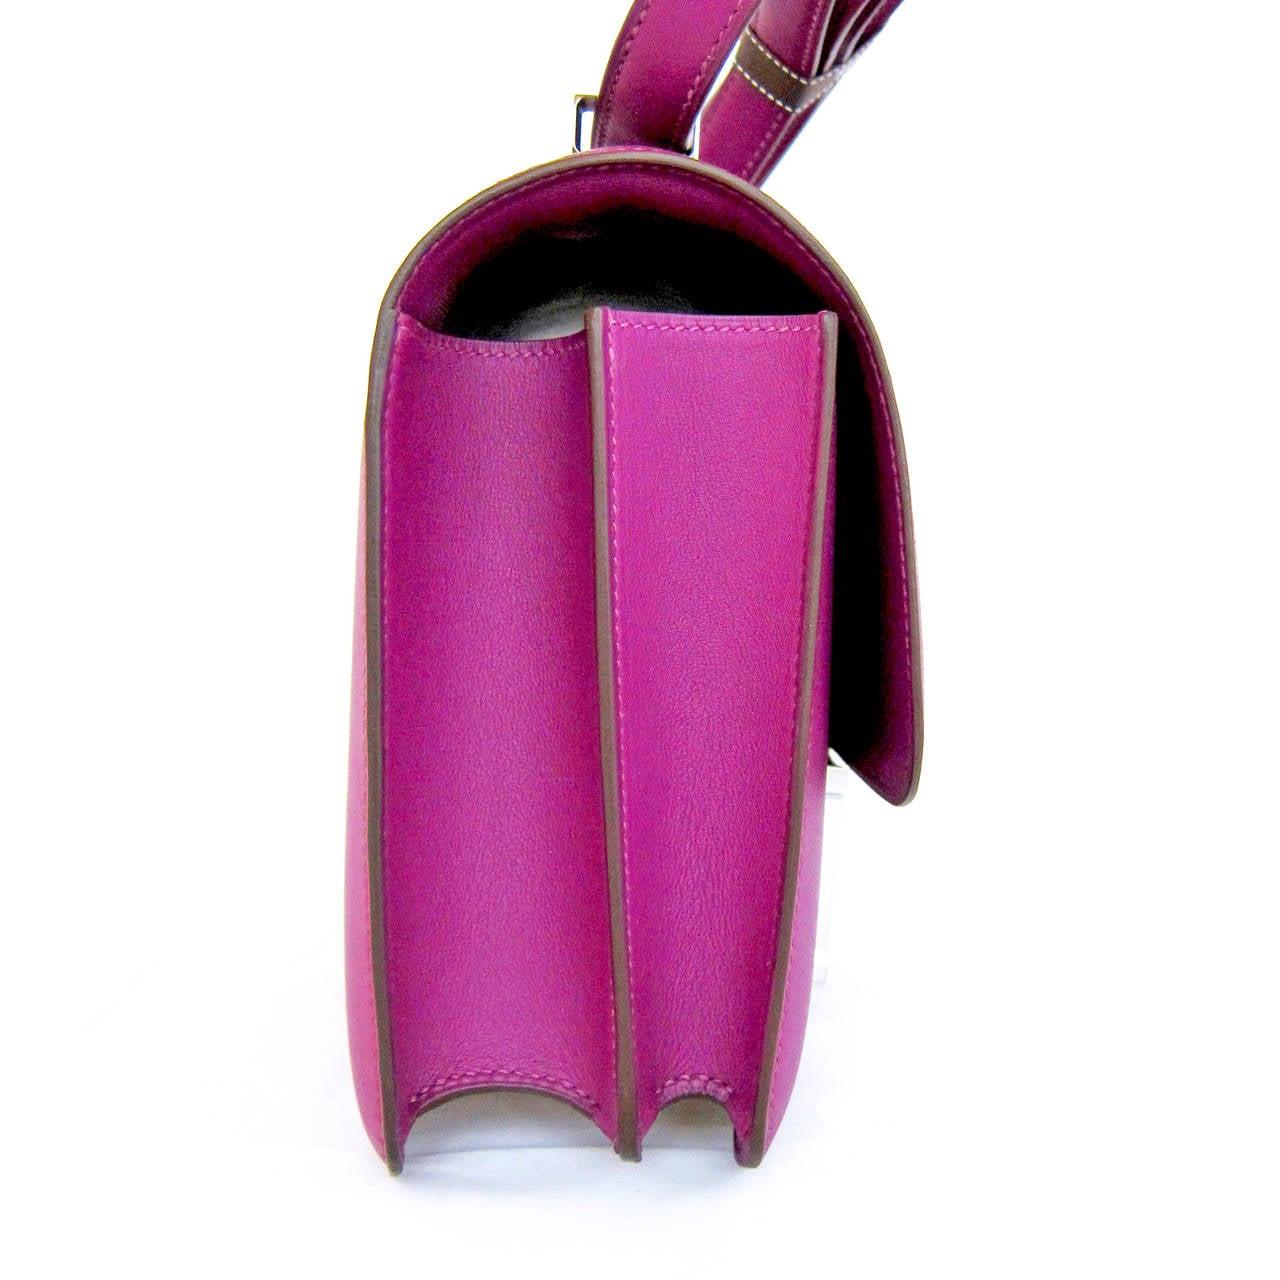 Hermes Anemone Constance MM Shoulder Palladium PHW Bag For Sale at ...